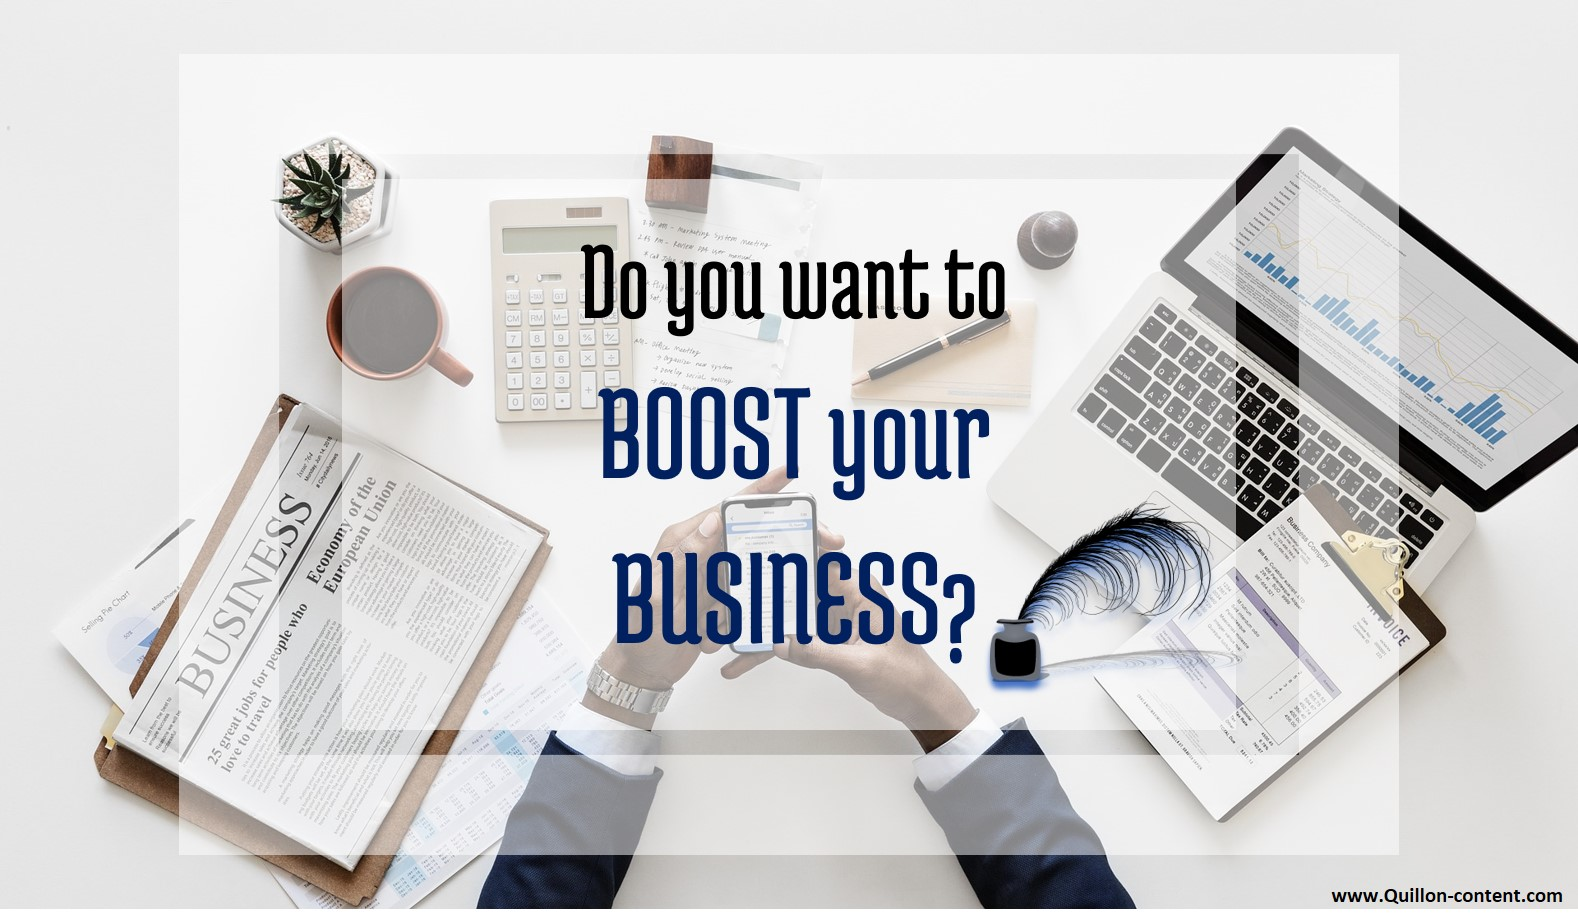 Business Strategies - Magazine cover